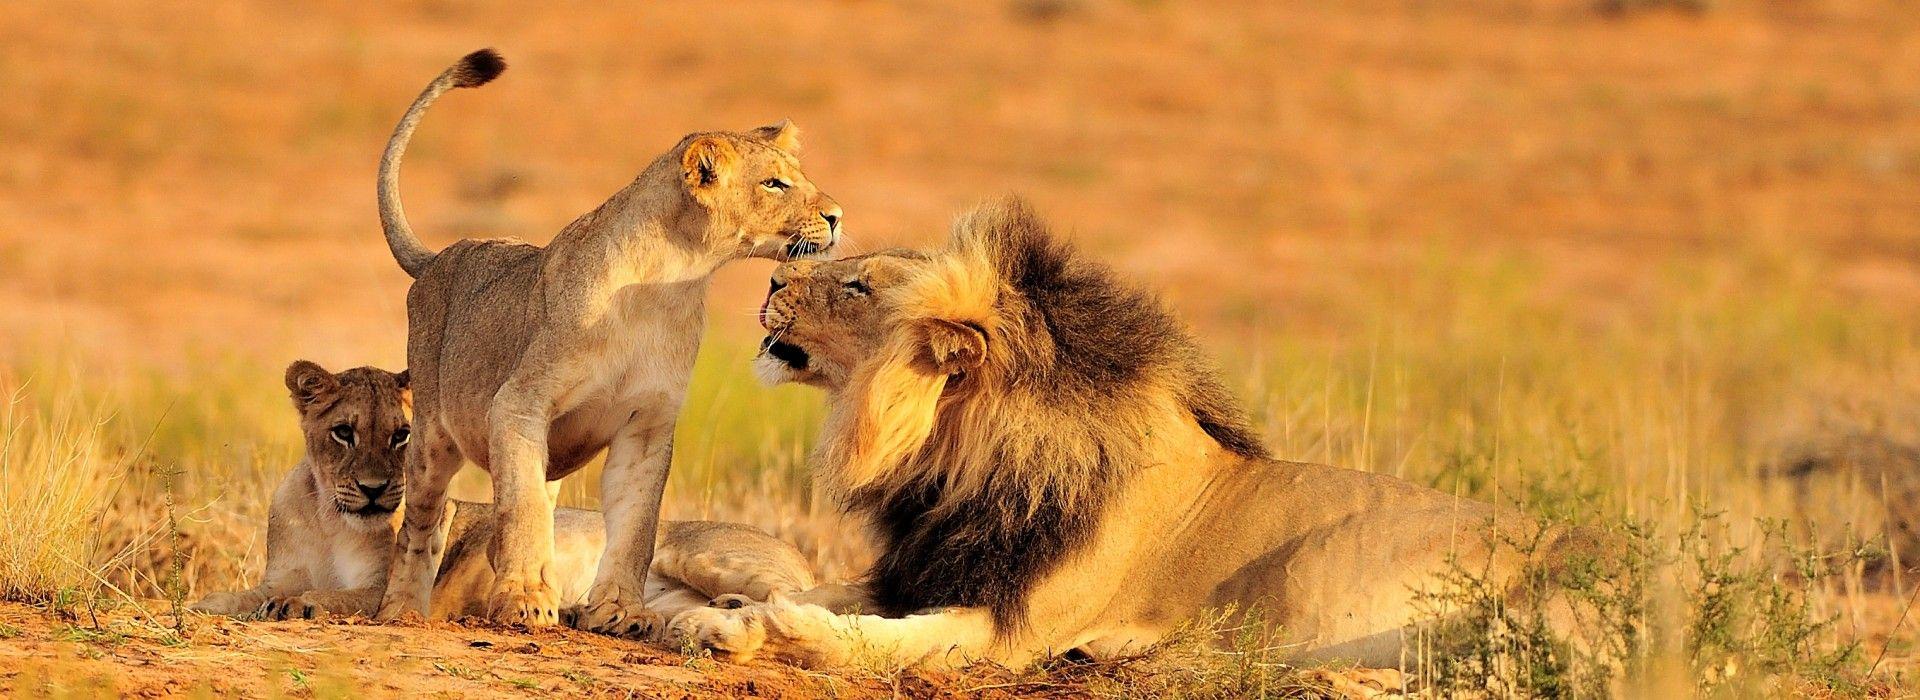 Self-drive or vehicle rental Tours in Kruger National Park